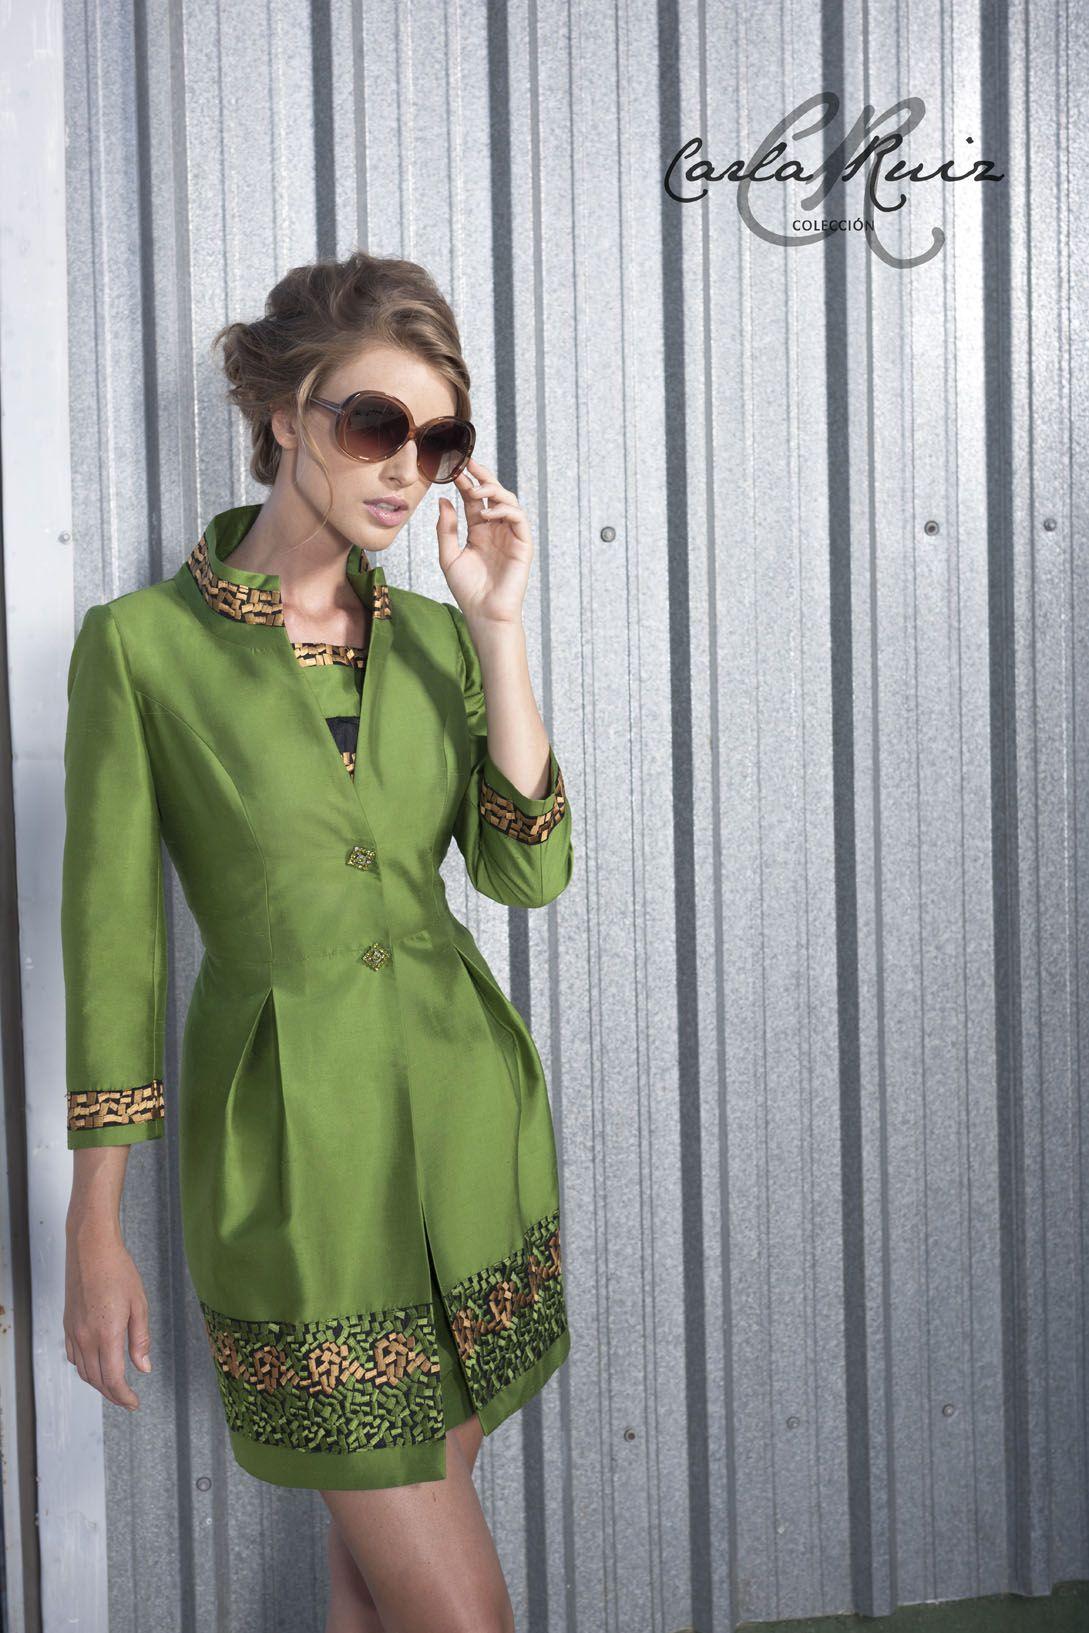 3f0f3ca002 Vestido de Madrina de Carla Ruiz 2012 - Modelo 86315